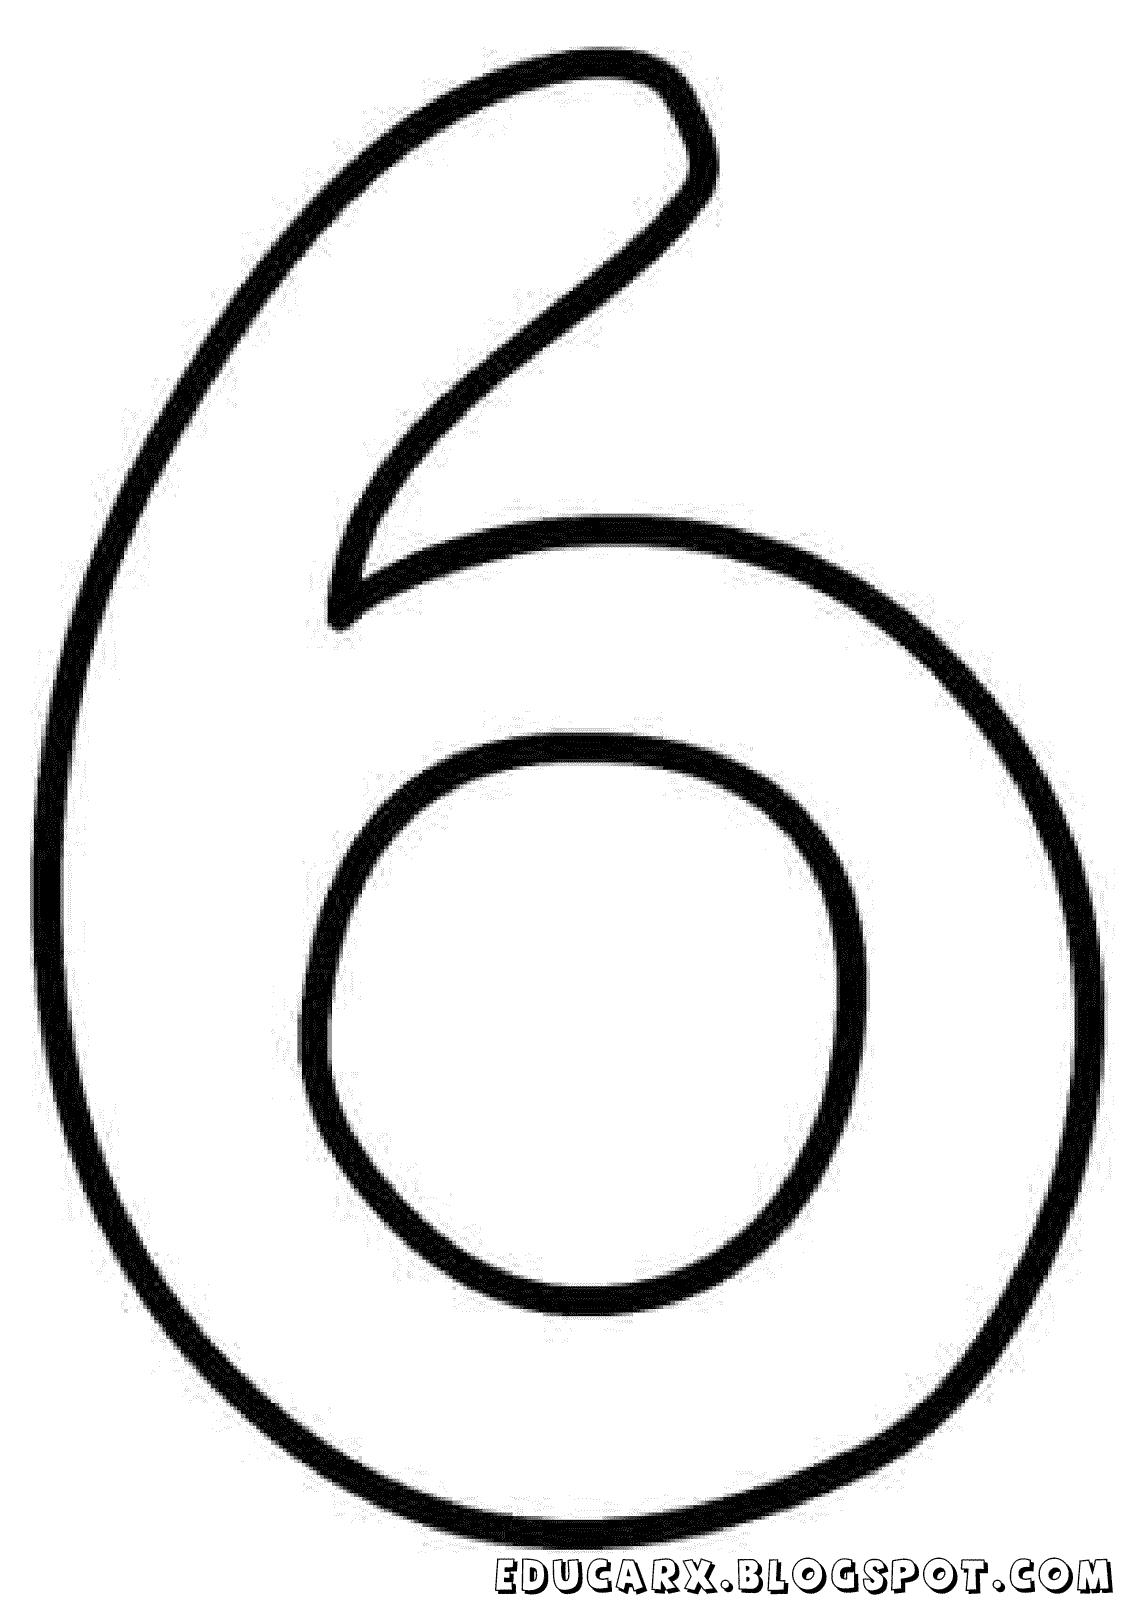 Molde do numero 6